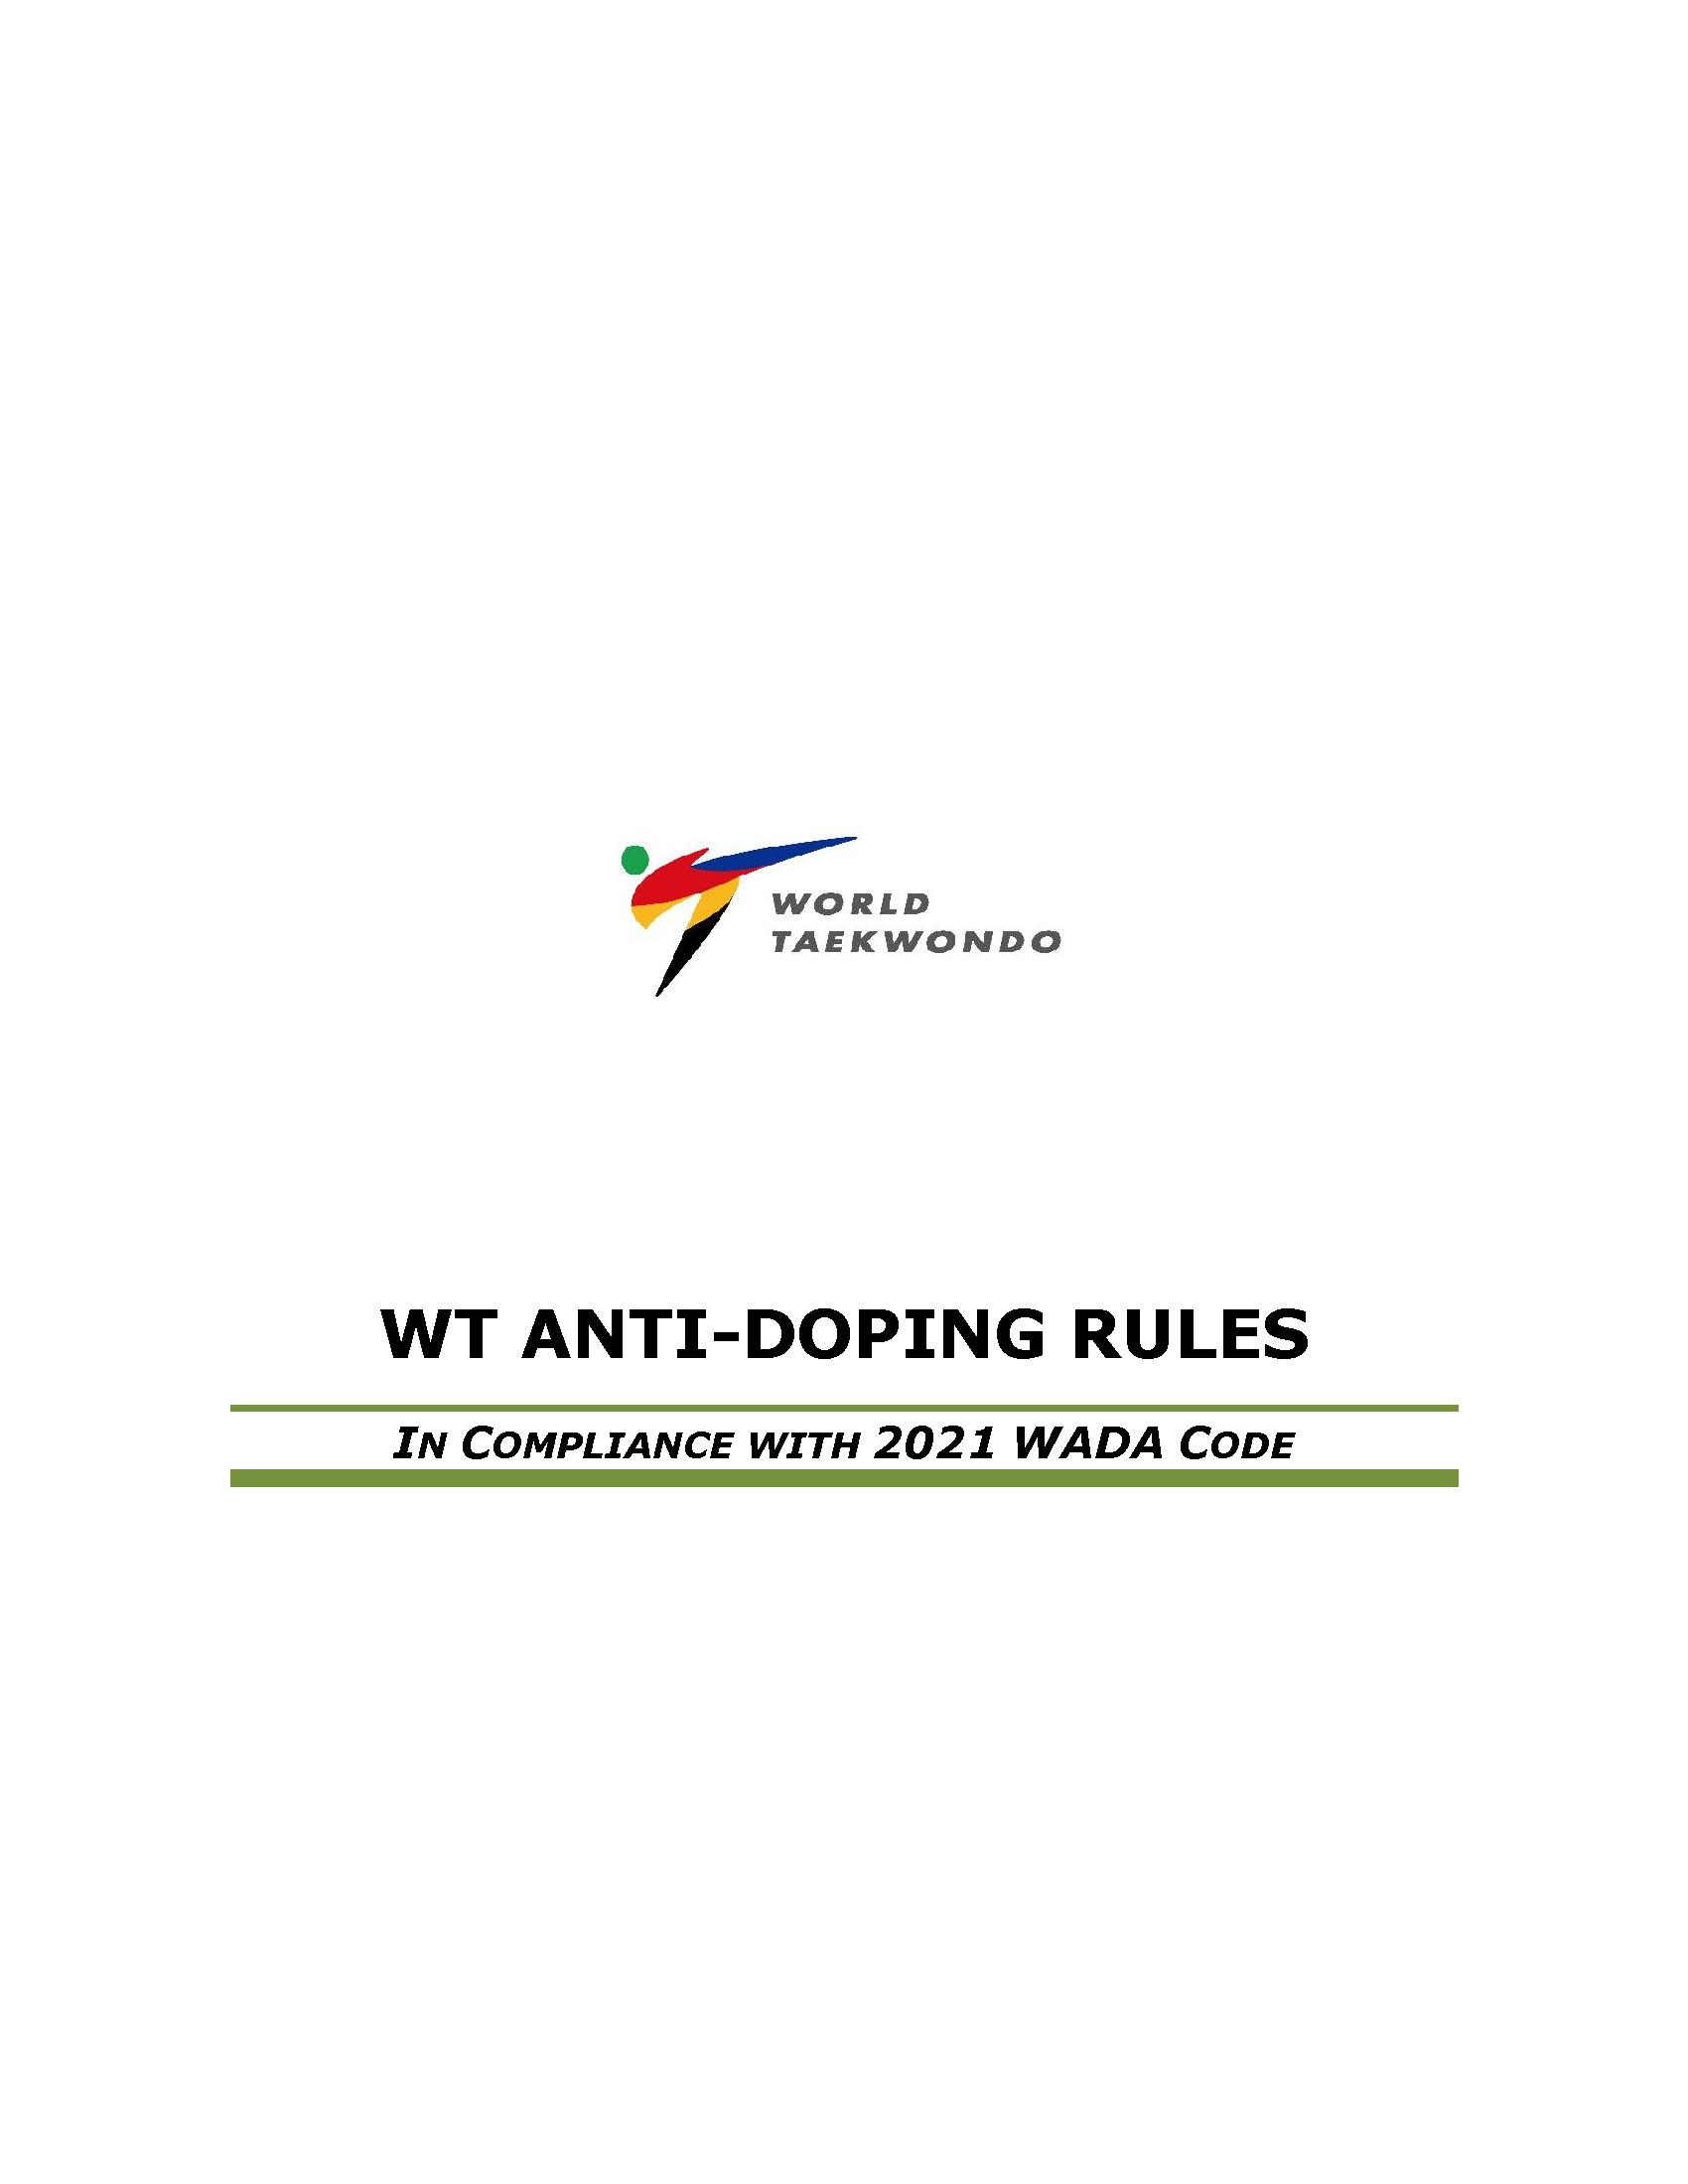 World Taekwondo (WT) Anti-Doping Rules